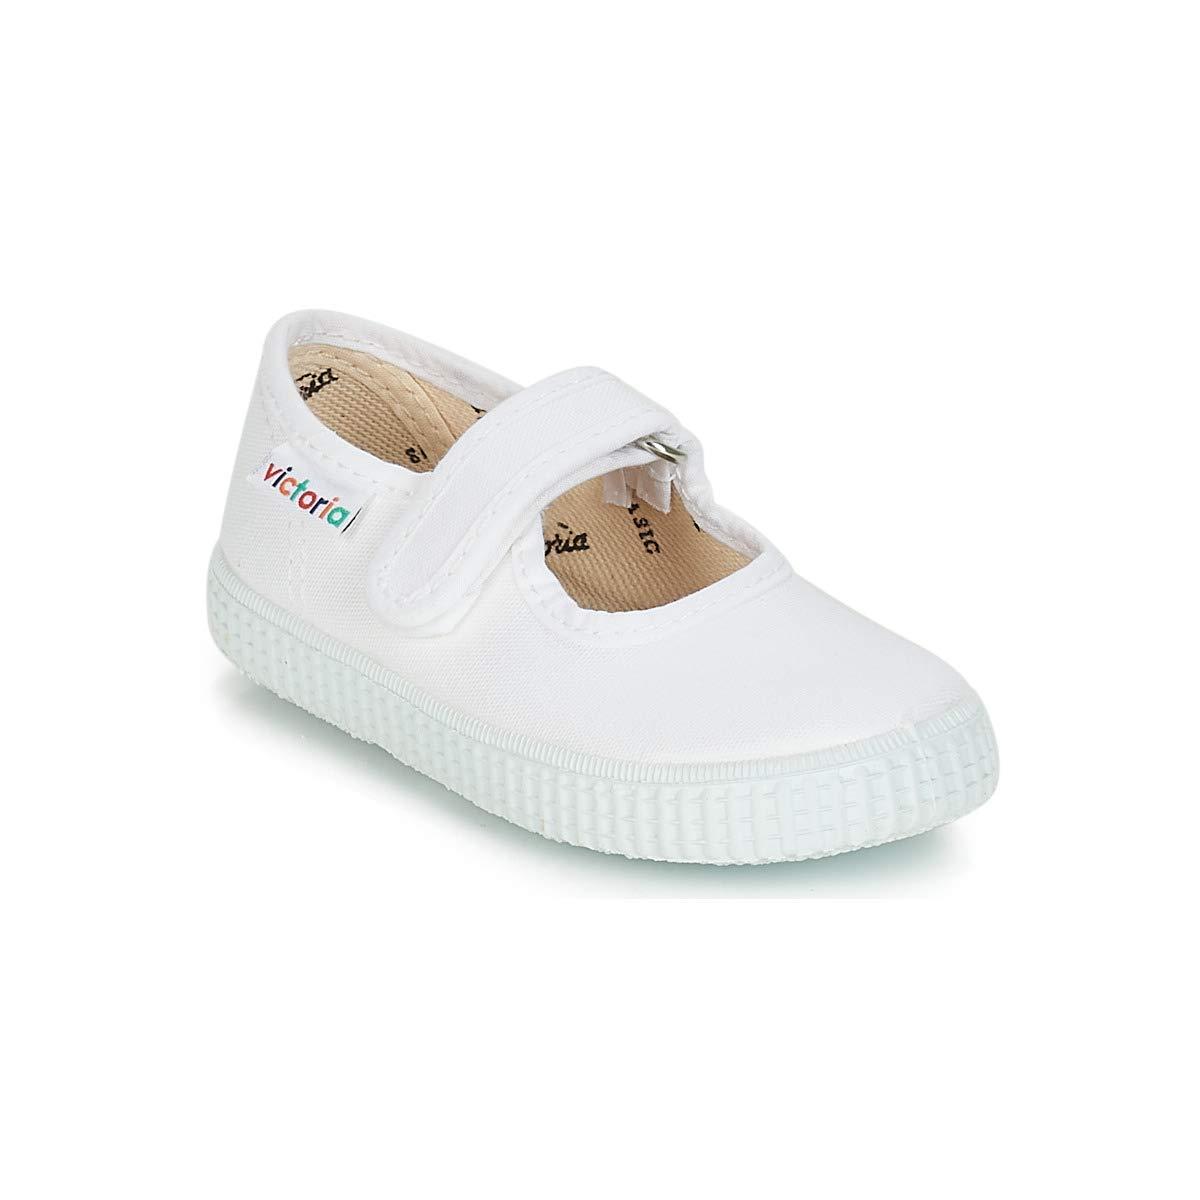 Sneaker Unisex victoria 1915 Velcro Lona Bimbi 0-24